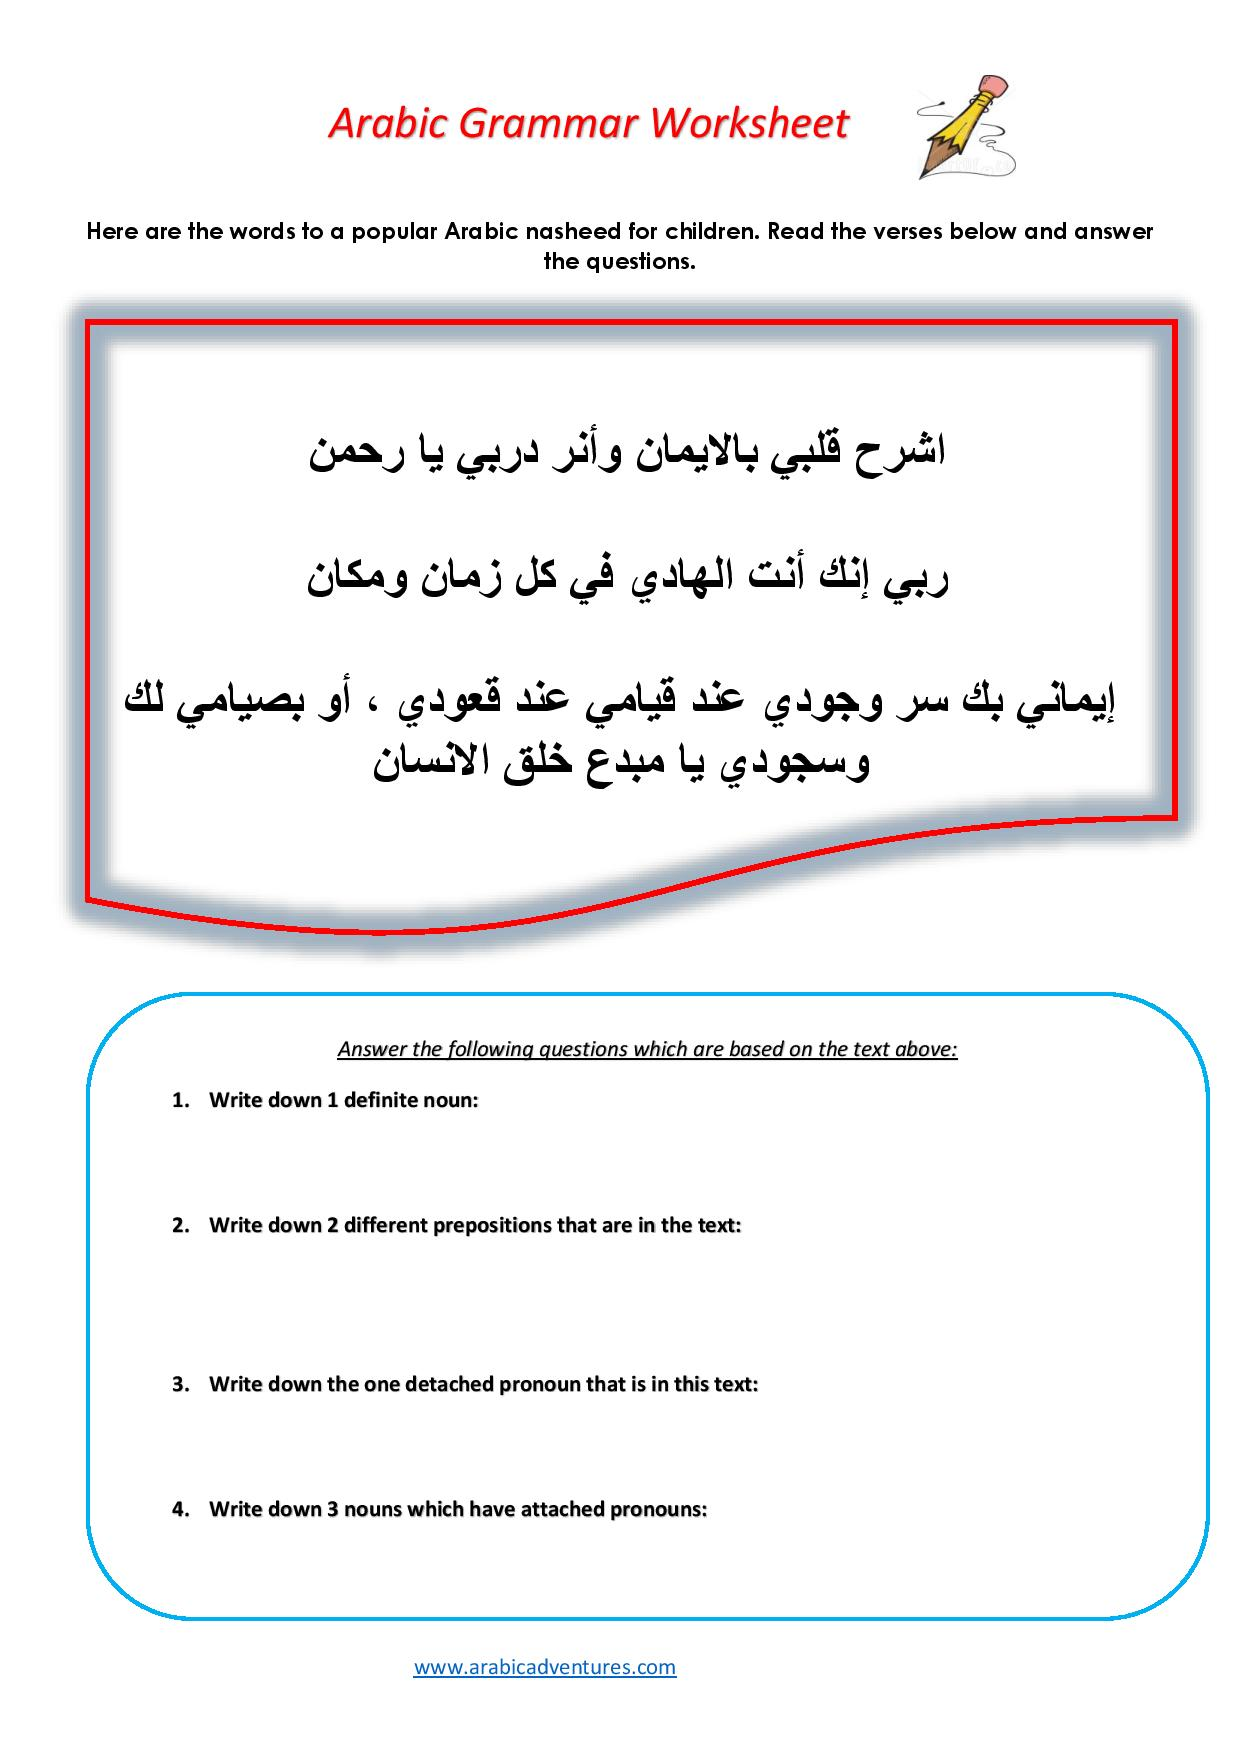 islamic printables arabic adventures. Black Bedroom Furniture Sets. Home Design Ideas